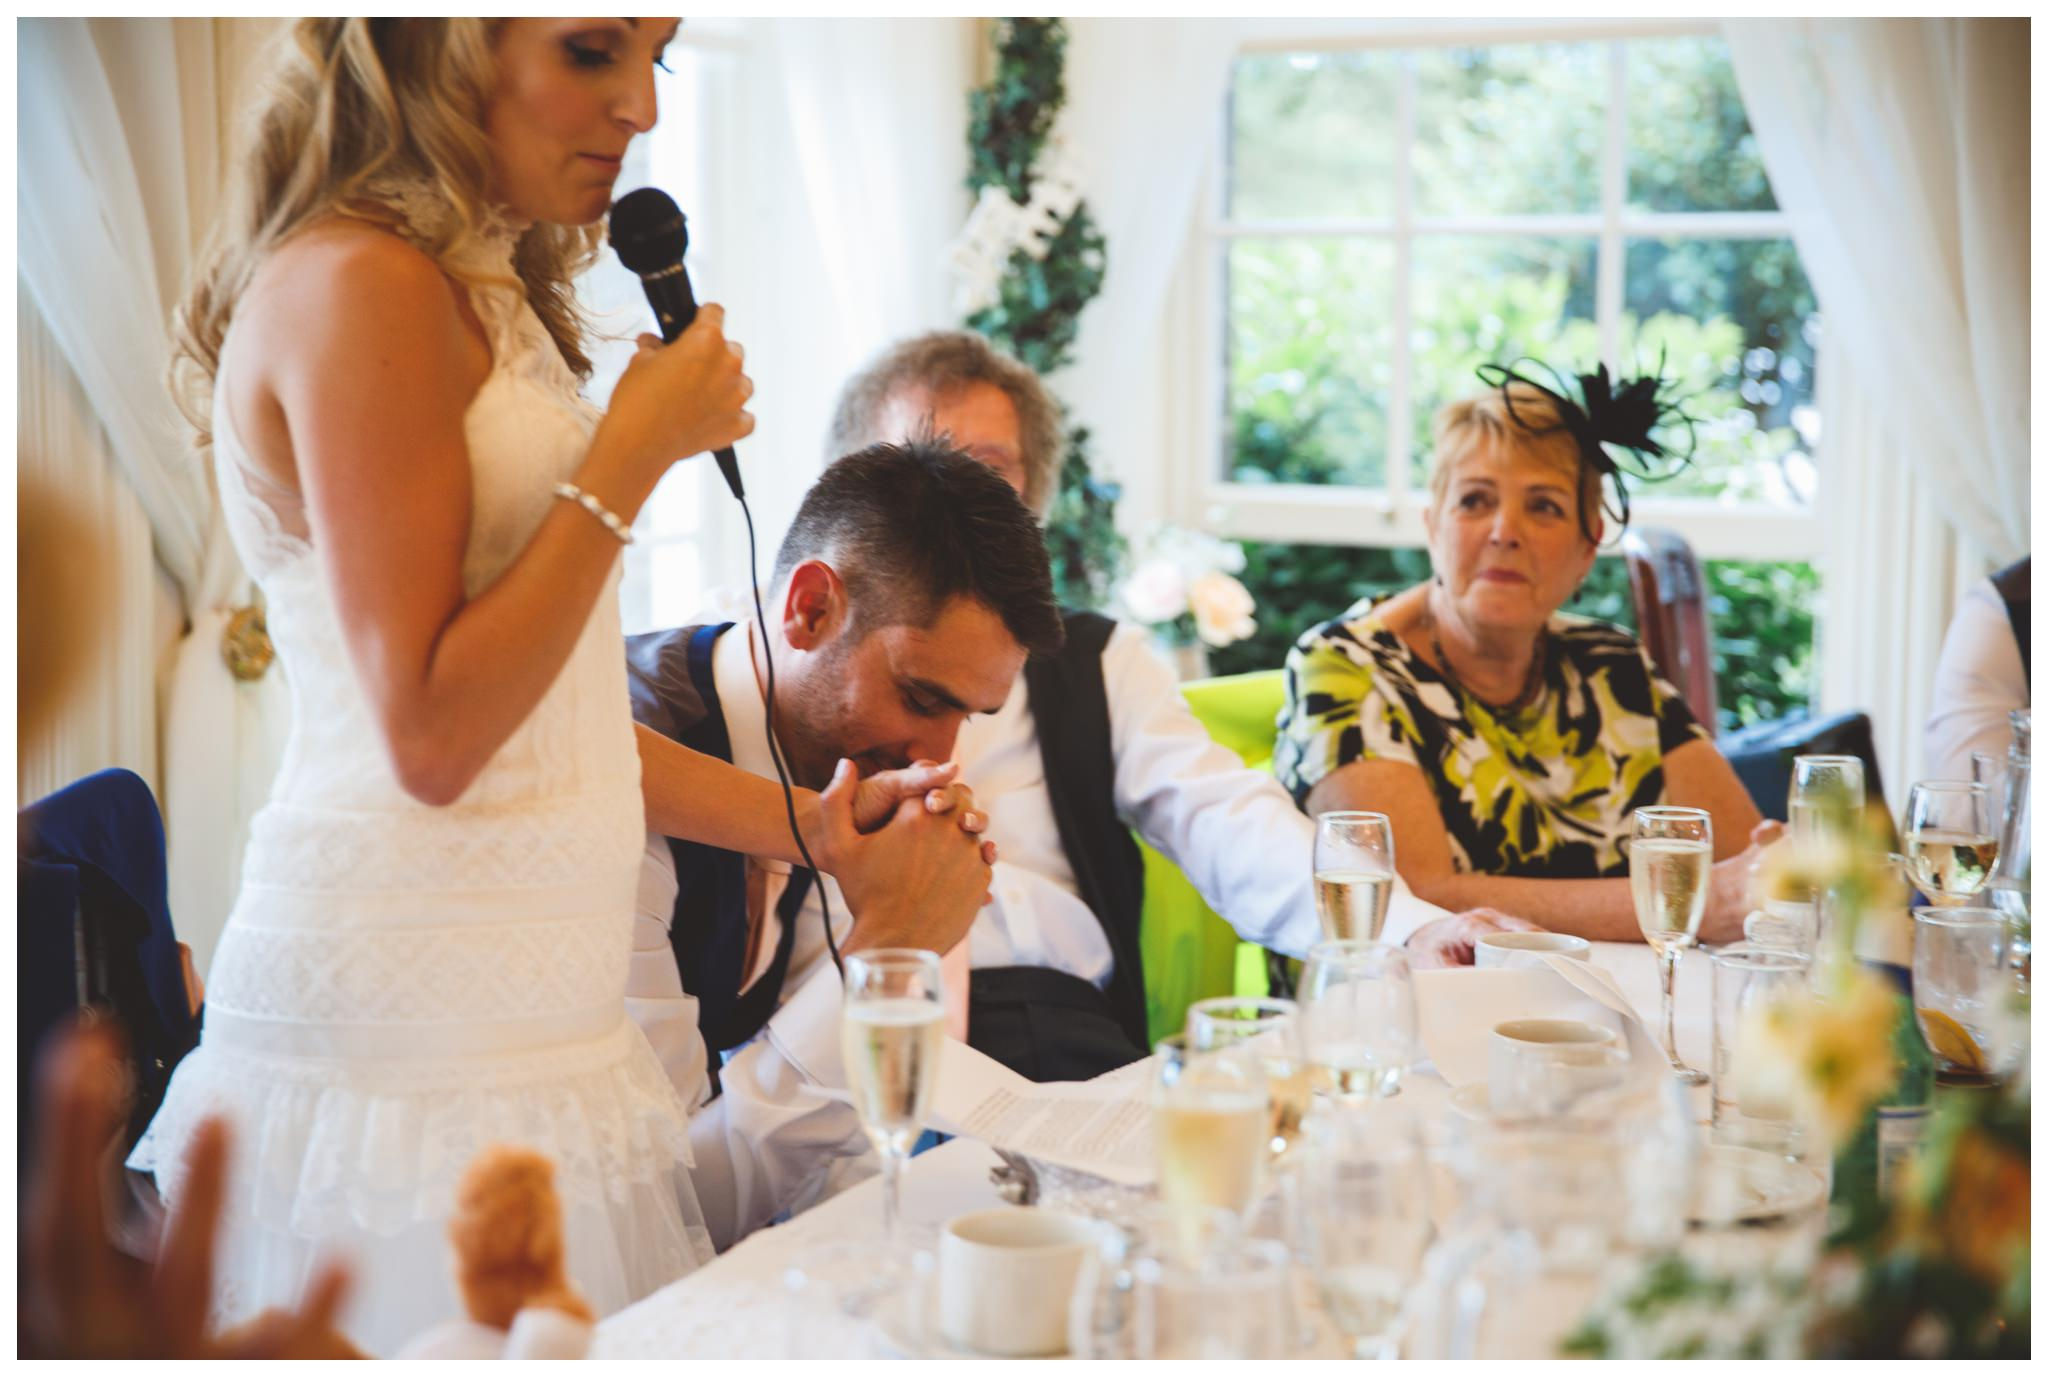 Richard Savage Photography - Wedding - Peterstone Court Brecon - 2016-05-11_0053